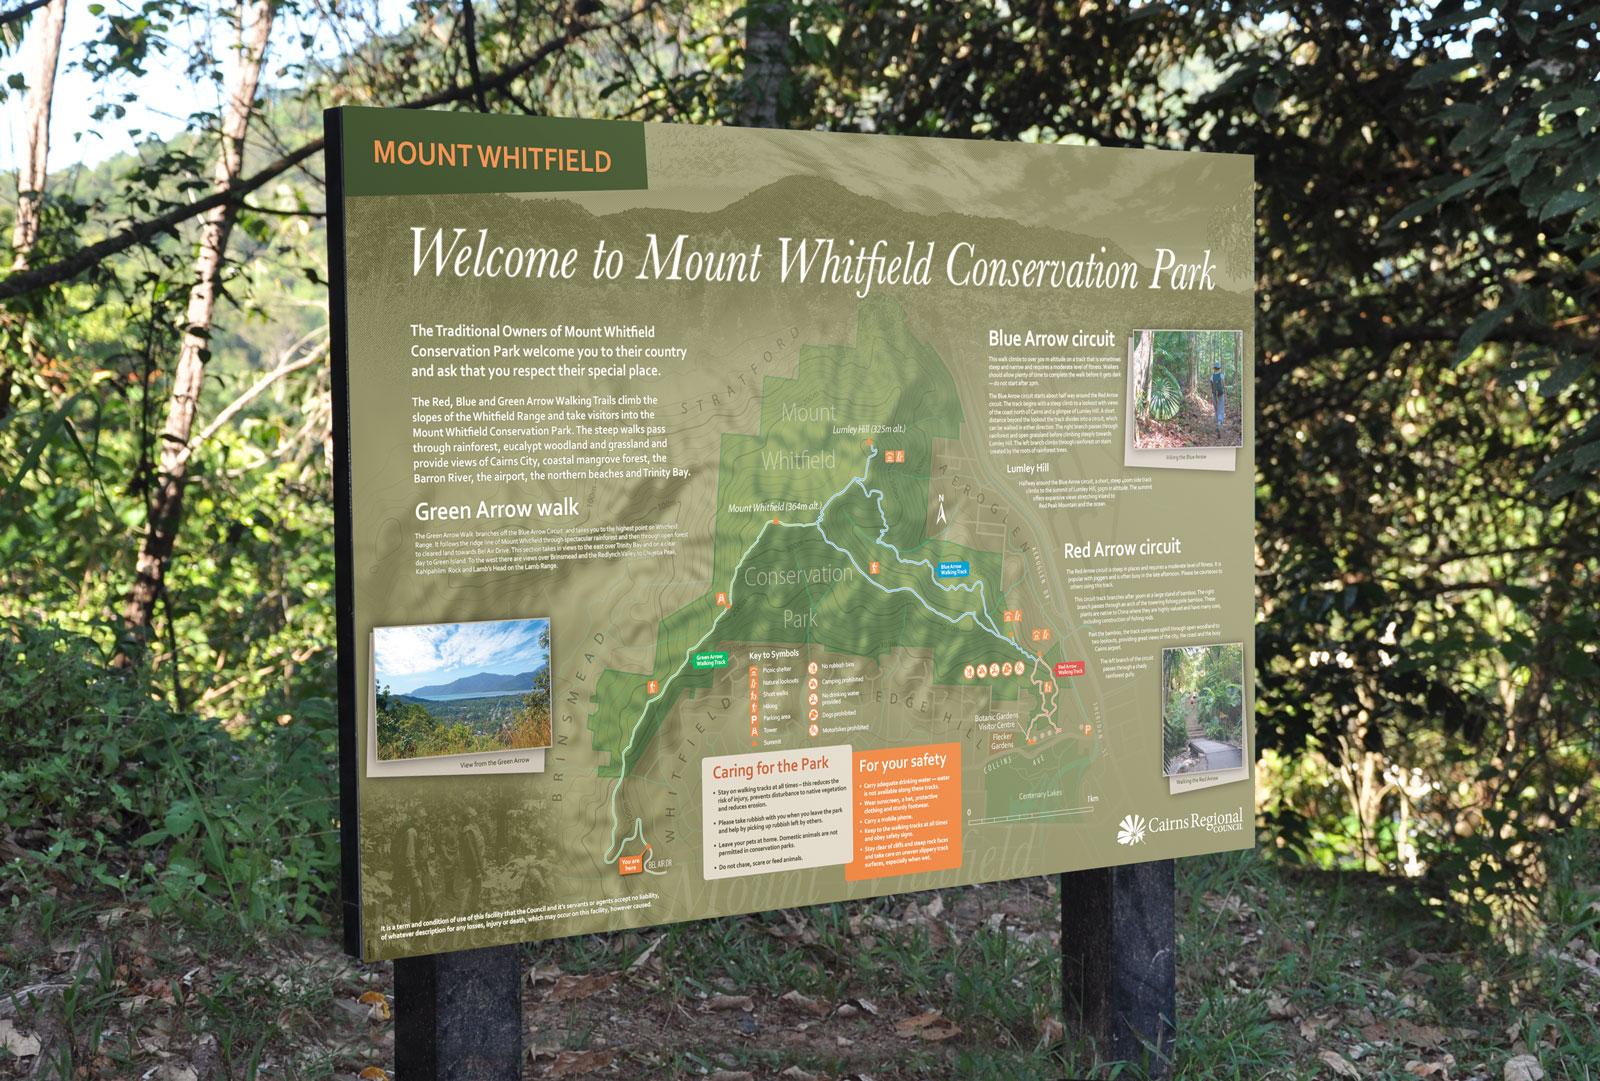 Mt Whitfield Conservation Park